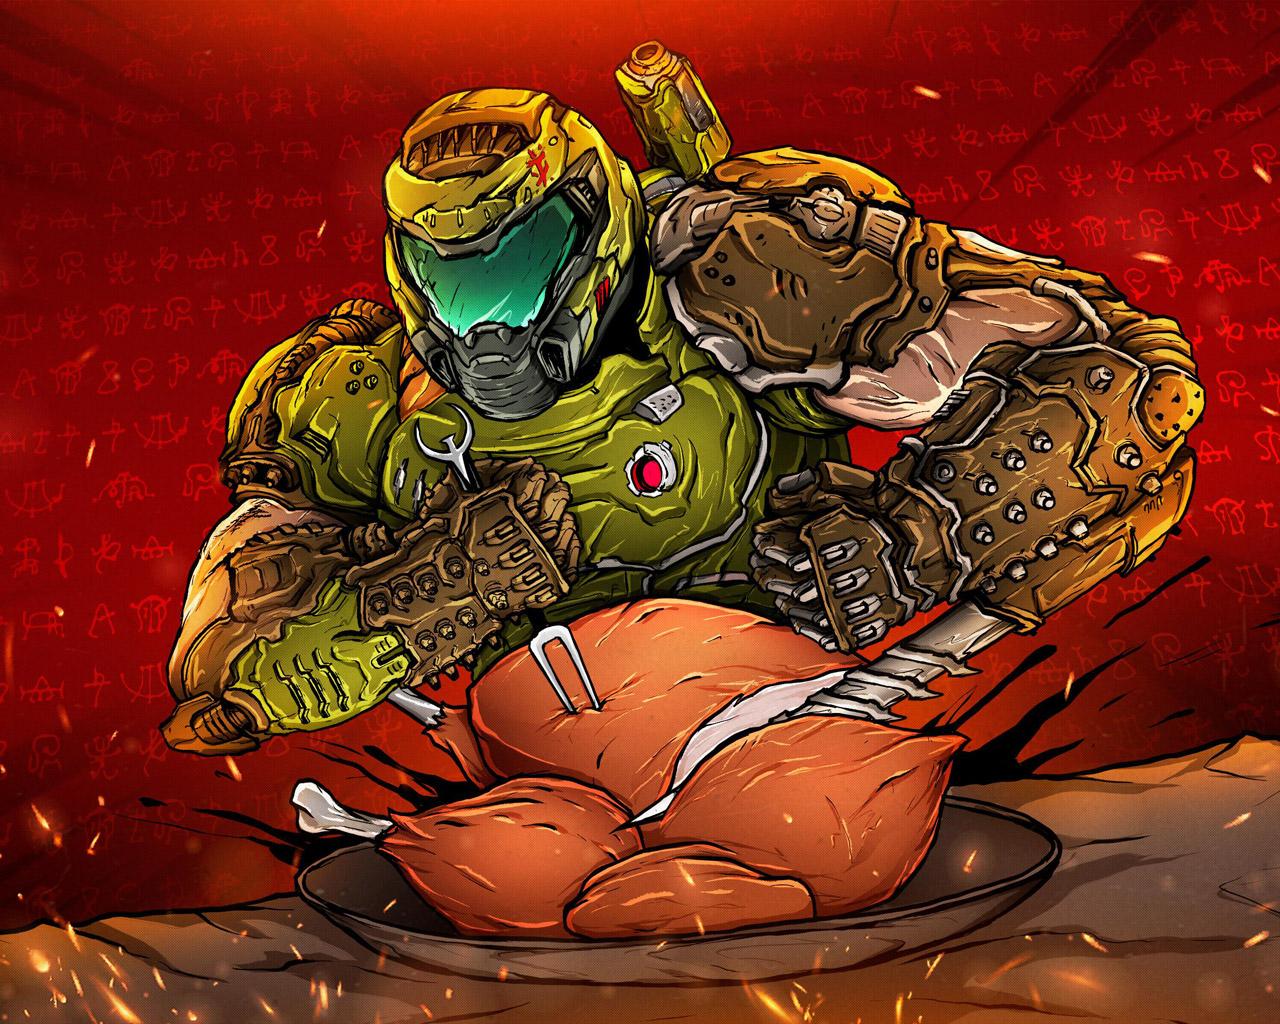 Free Doom Eternal Wallpaper in 1280x1024